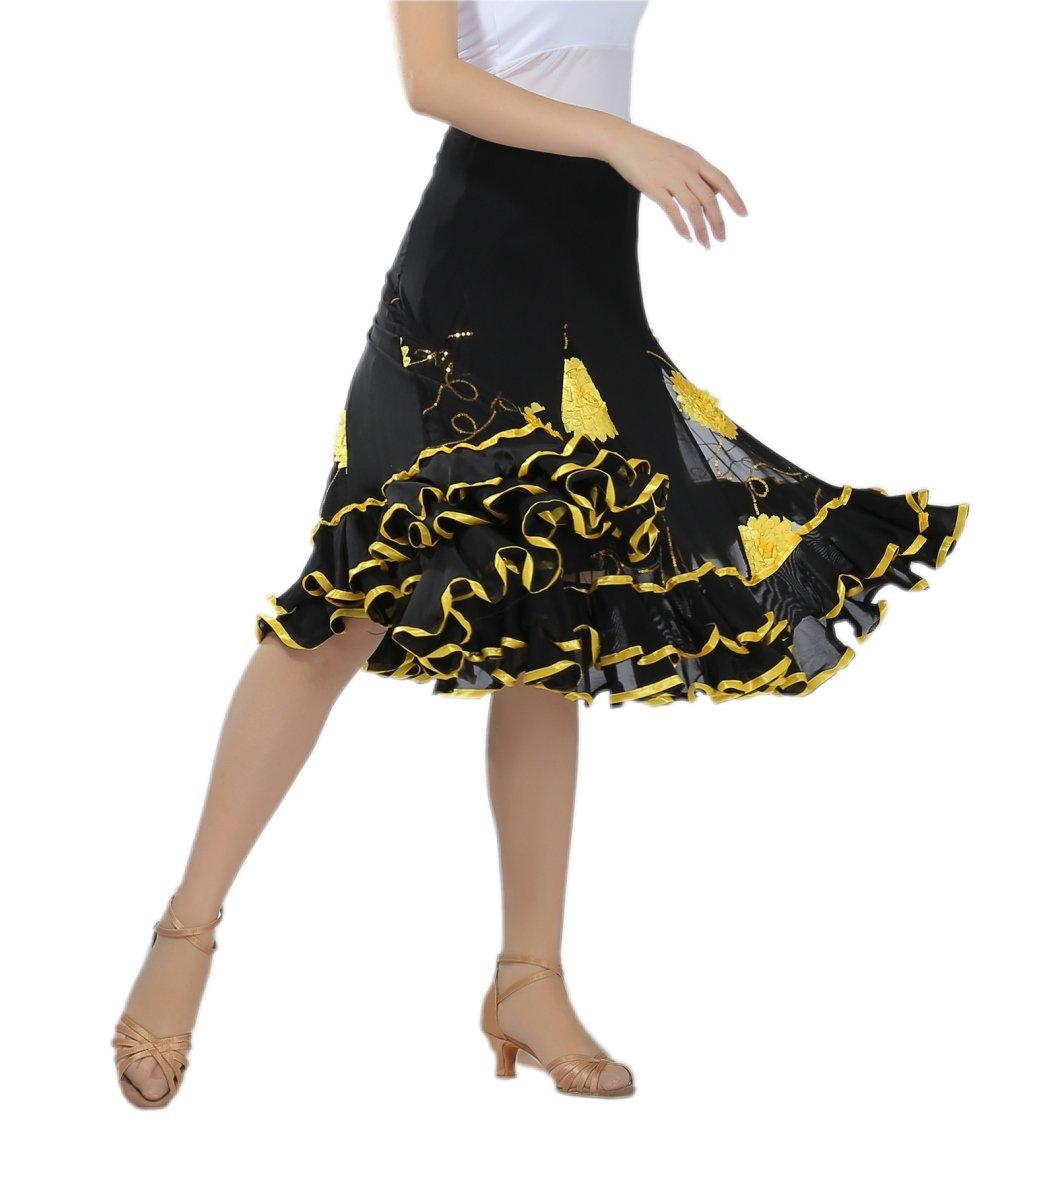 CISMARK Micro Fiber Long Swing Ballroom Latin Dance Skirt One Size Yellow by CISMARK